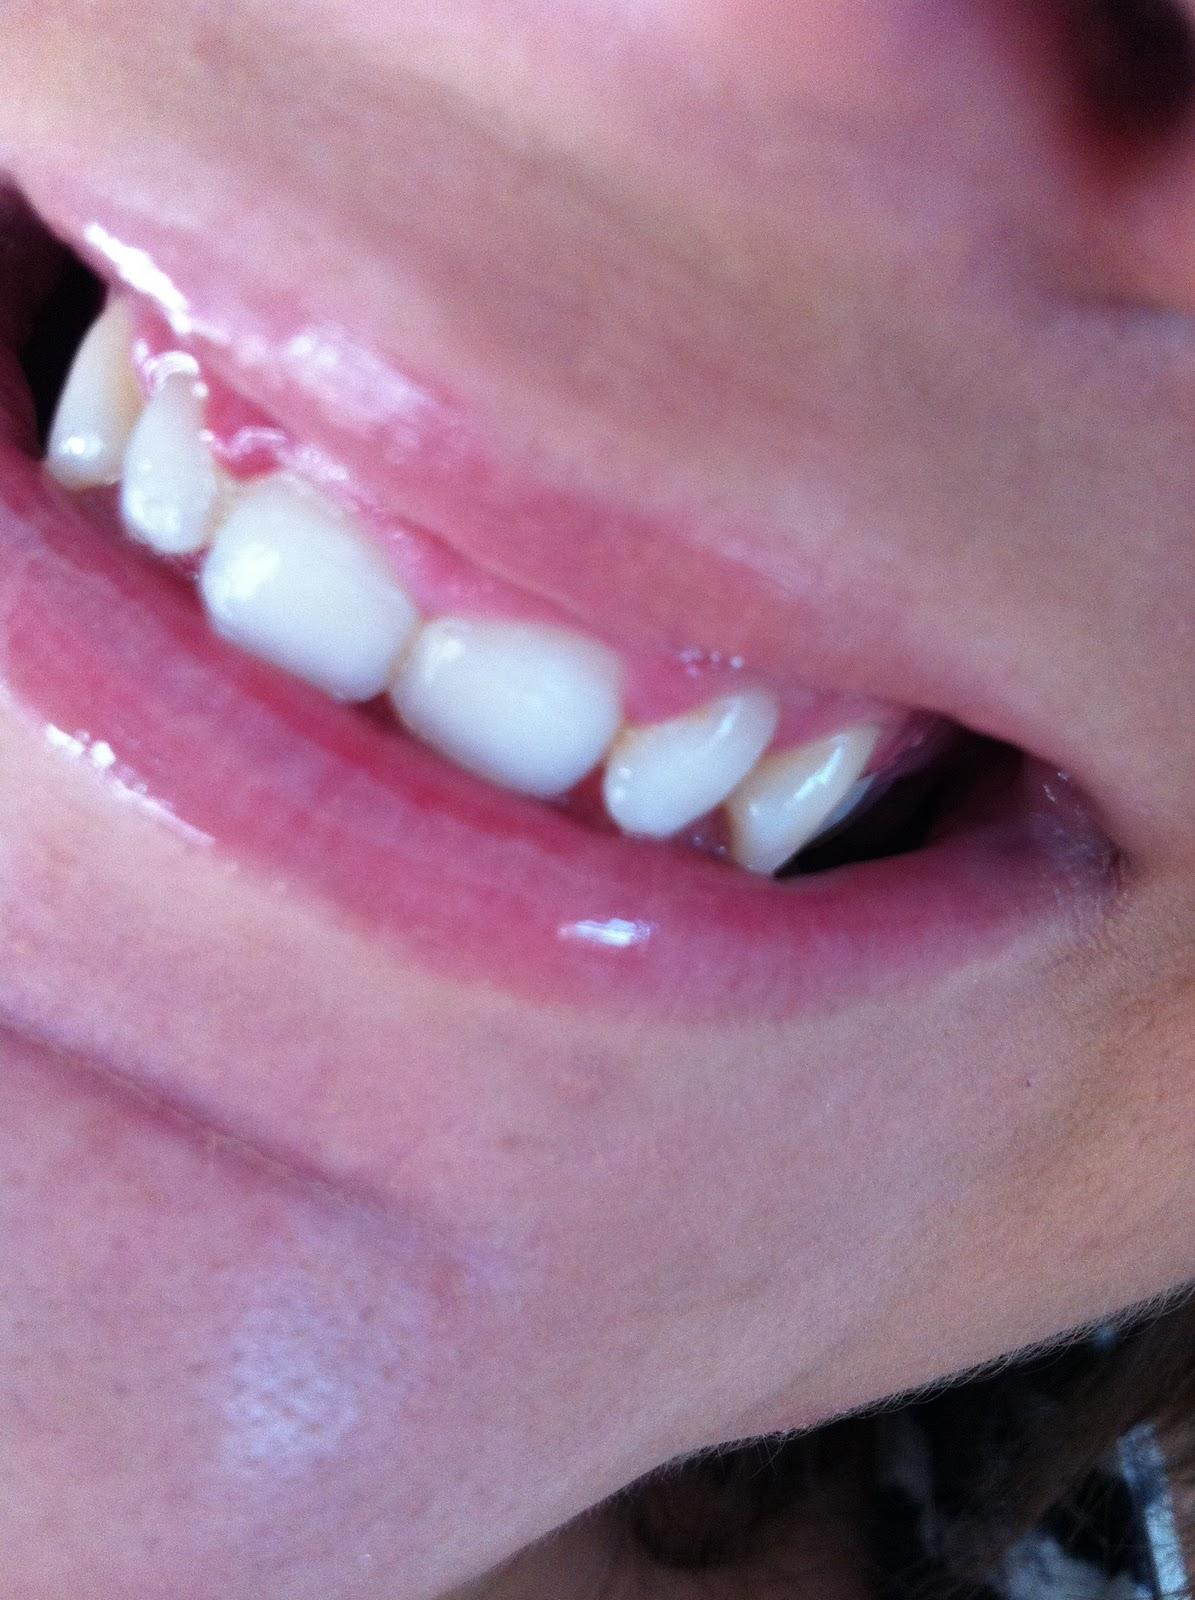 novon white dental beauty instructions